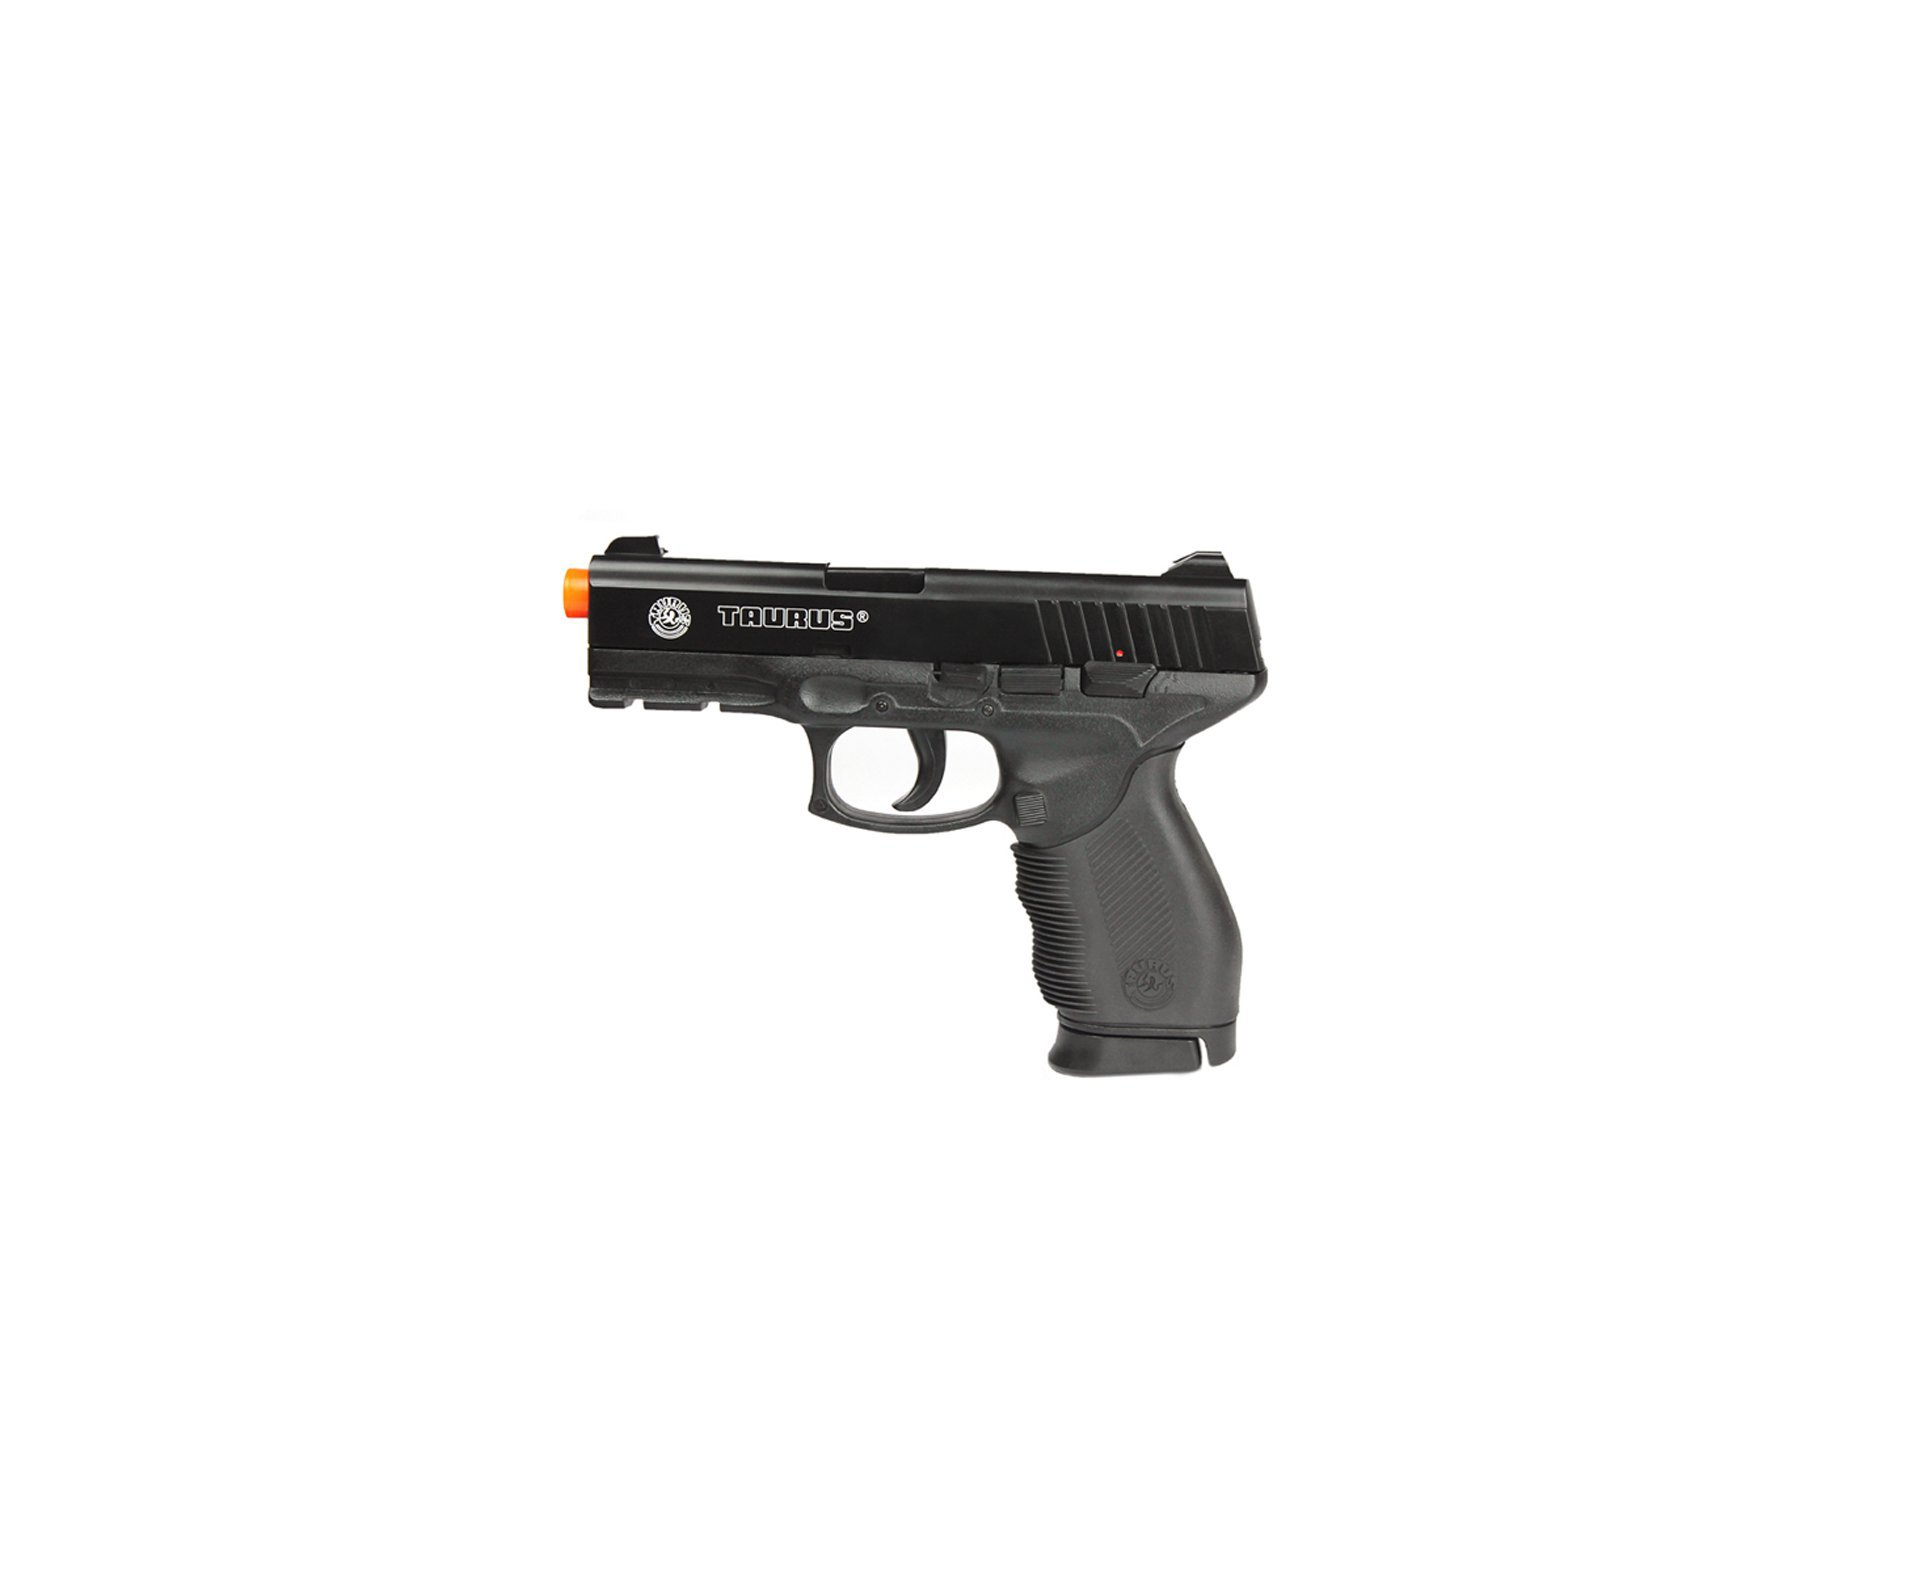 Pistola De Airsoft Taurus Pt 24/7 Semi/metal Cal 6,0 Mm + 4000 Esferas 0,12g + Case + Coldre Cintura - Cyber Gun